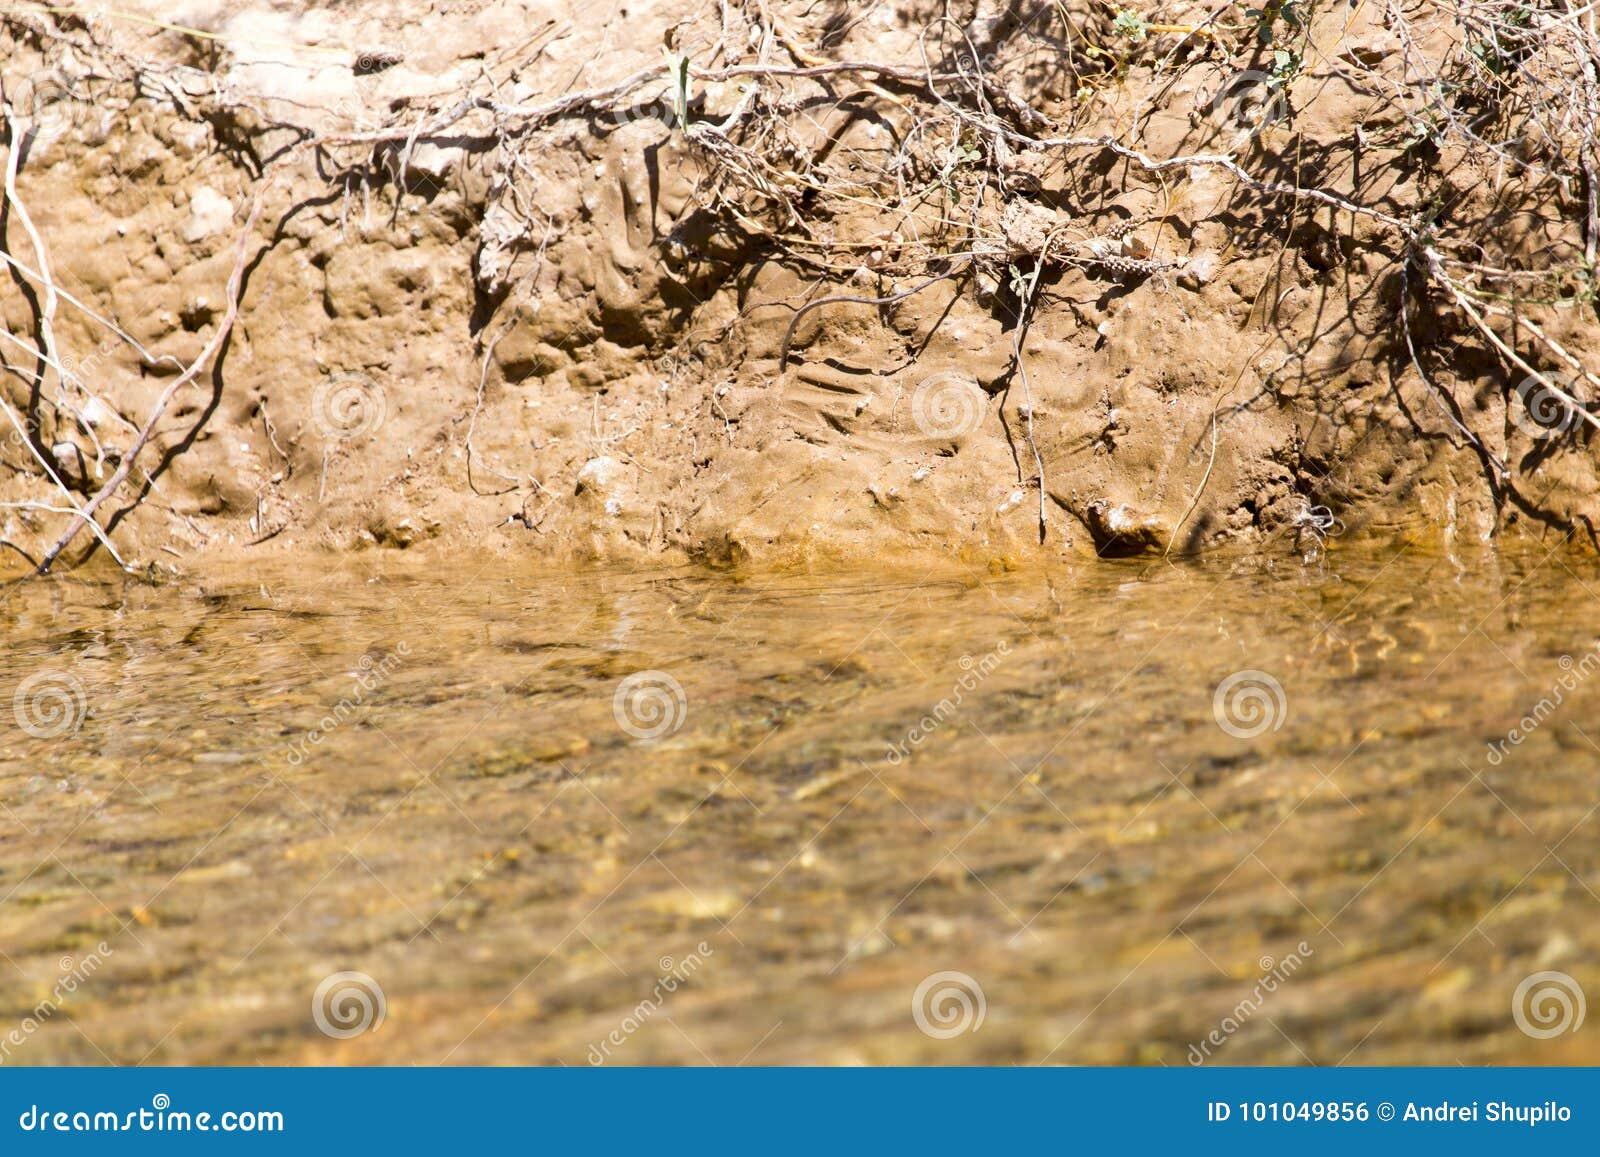 Shore of a small river